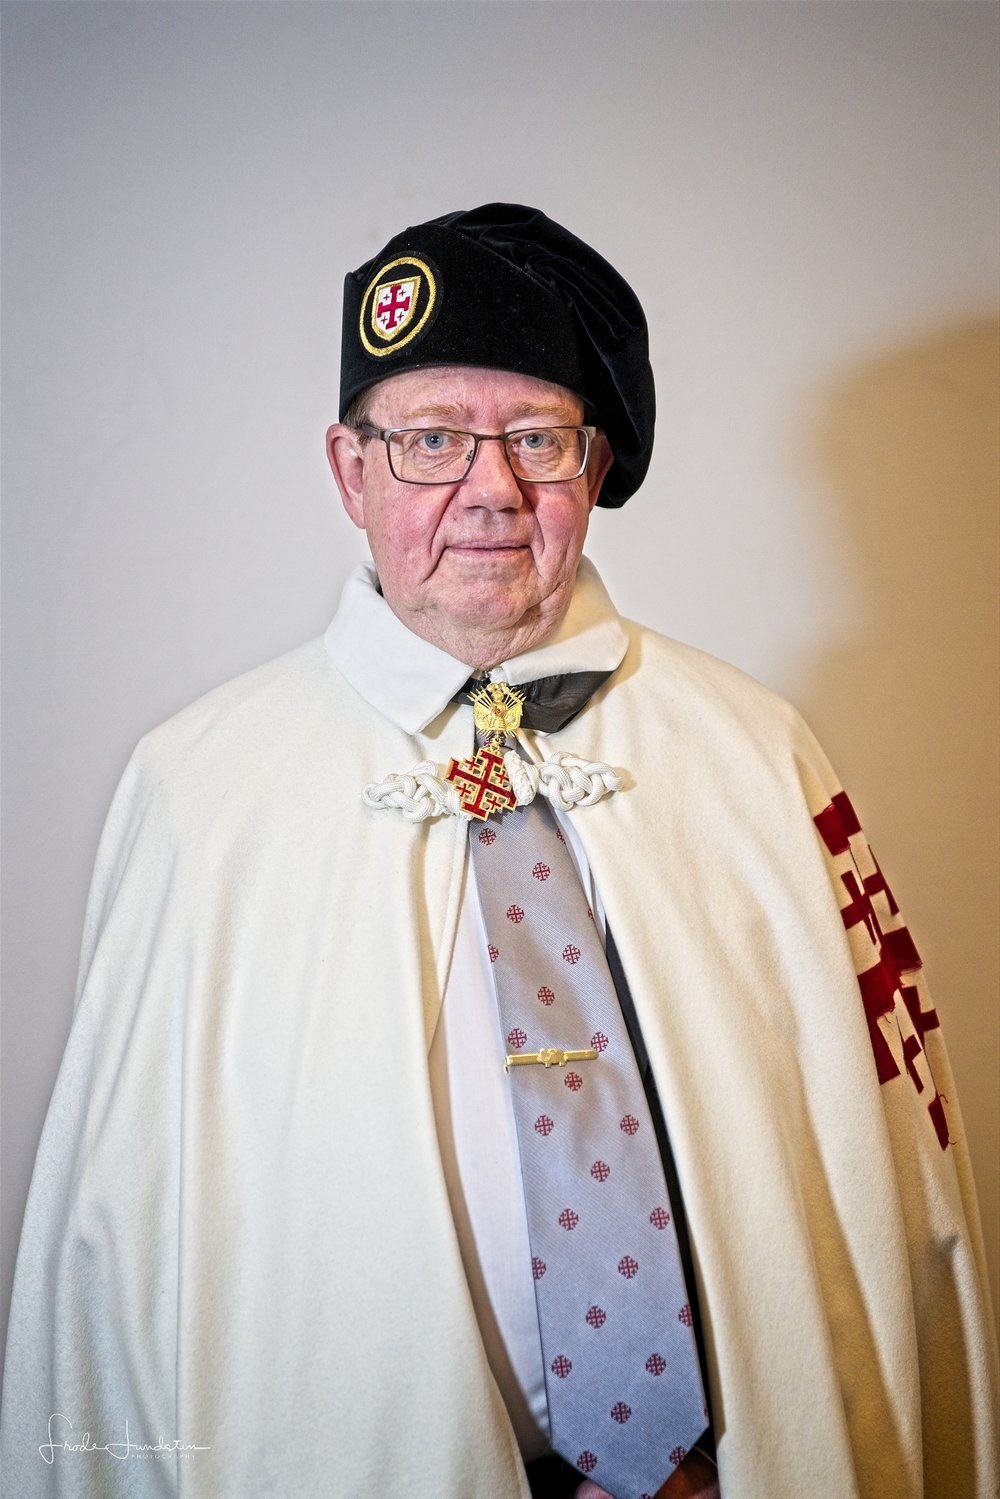 Statmester Sven Aulin KHGOmstj